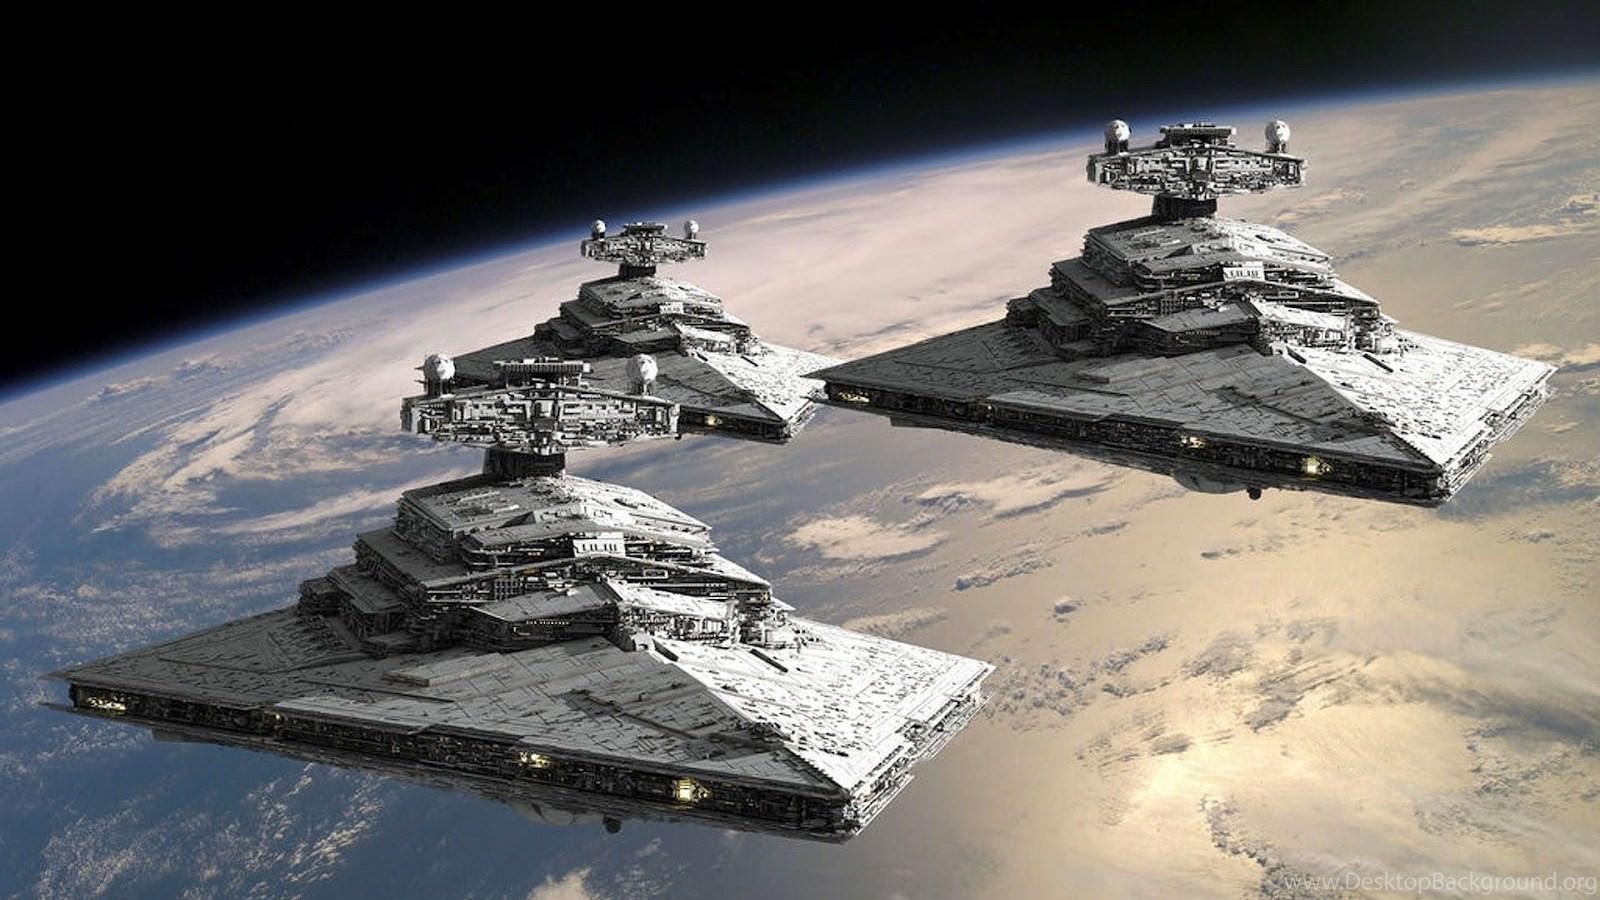 Star Wars Hd Wallpapers Desktop Backgrounds Background